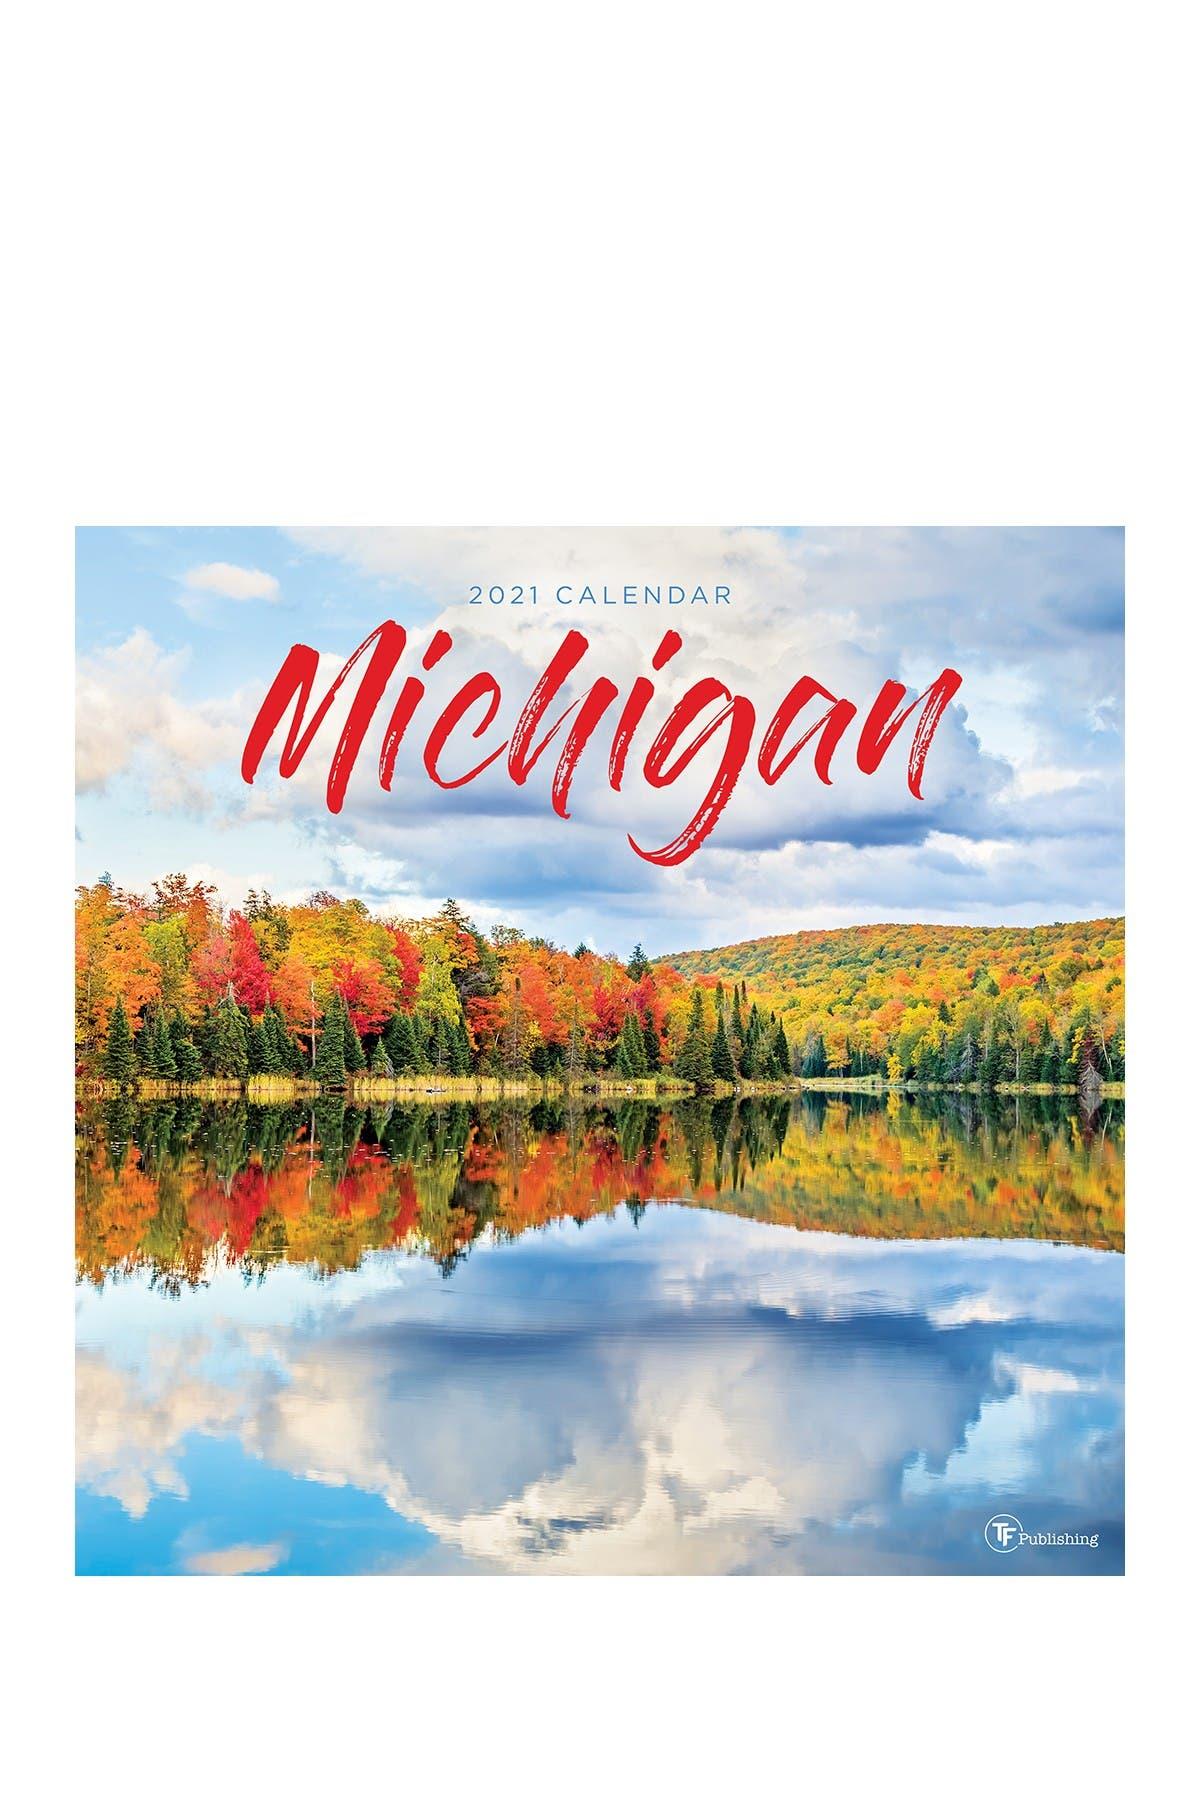 Image of TF Publishing 2021 Michigan Wall Calendar